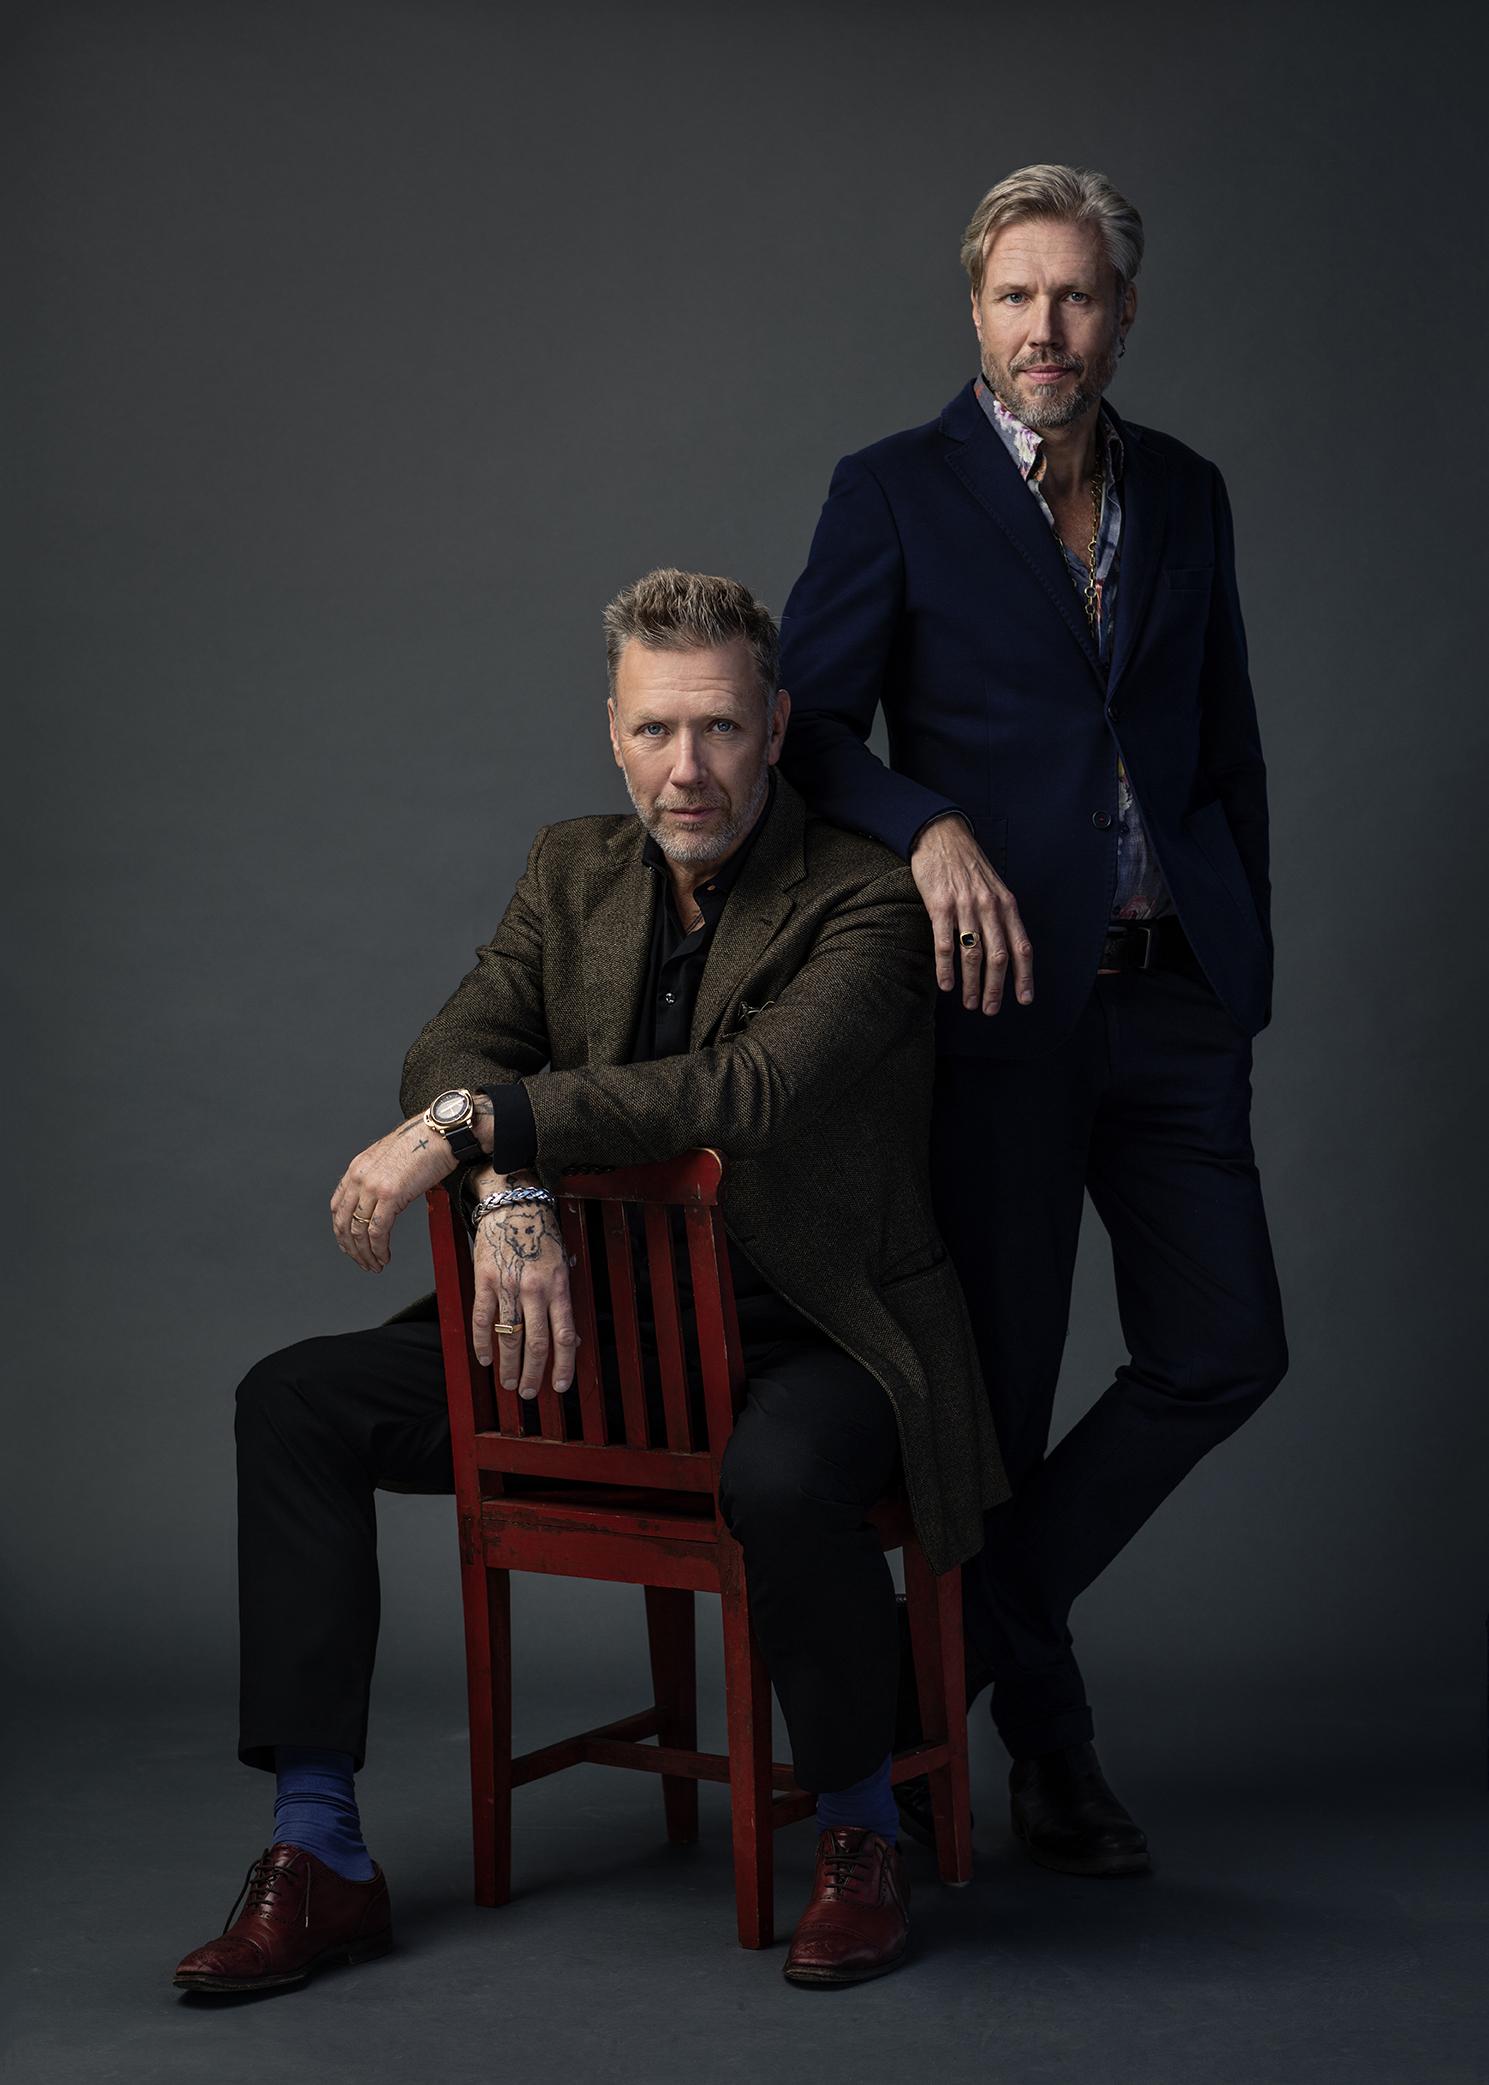 Mikael Persbrandt ja Carl-Johan Vallgren